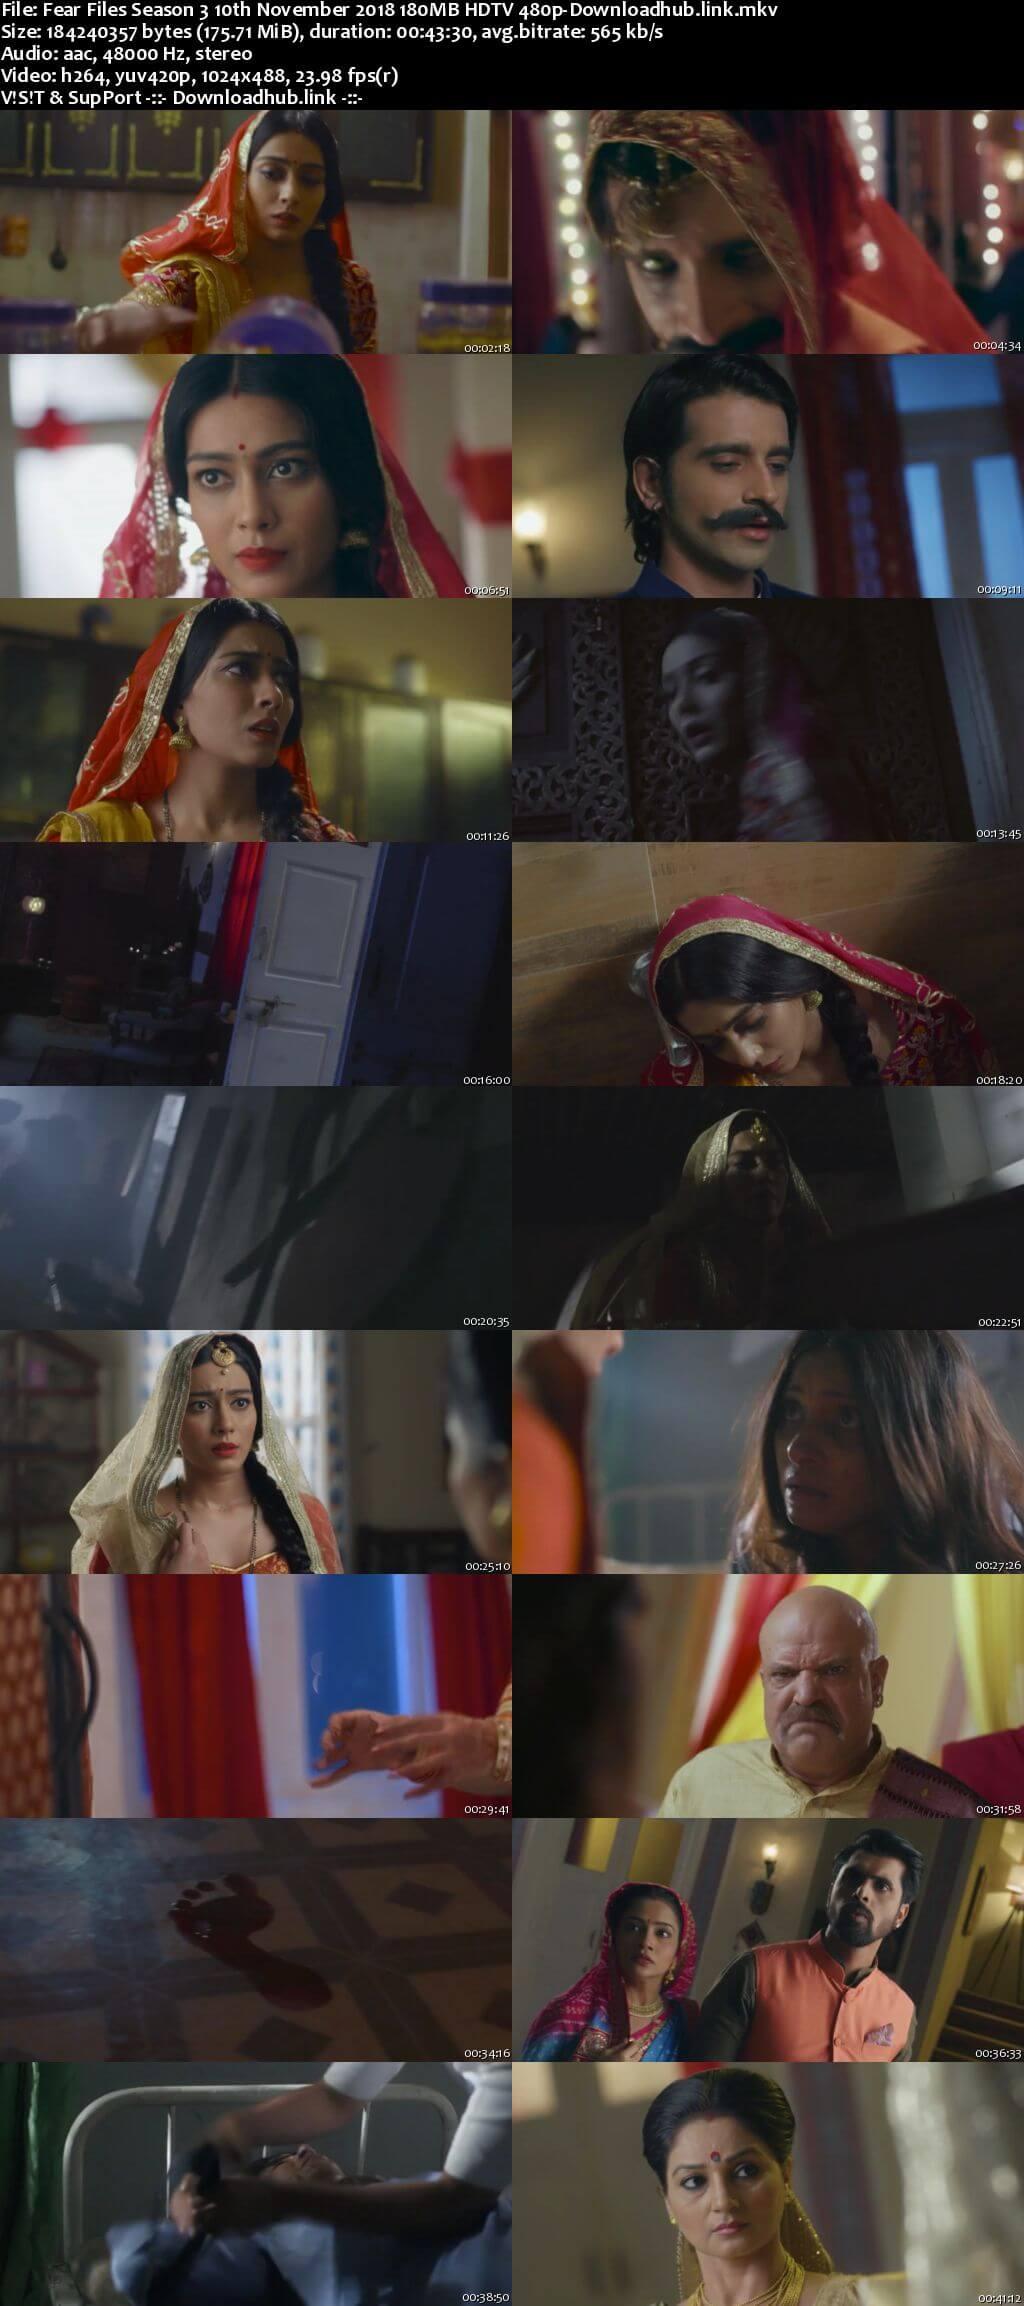 Fear Files Season 3 10th November 2018 180MB HDTV 480p